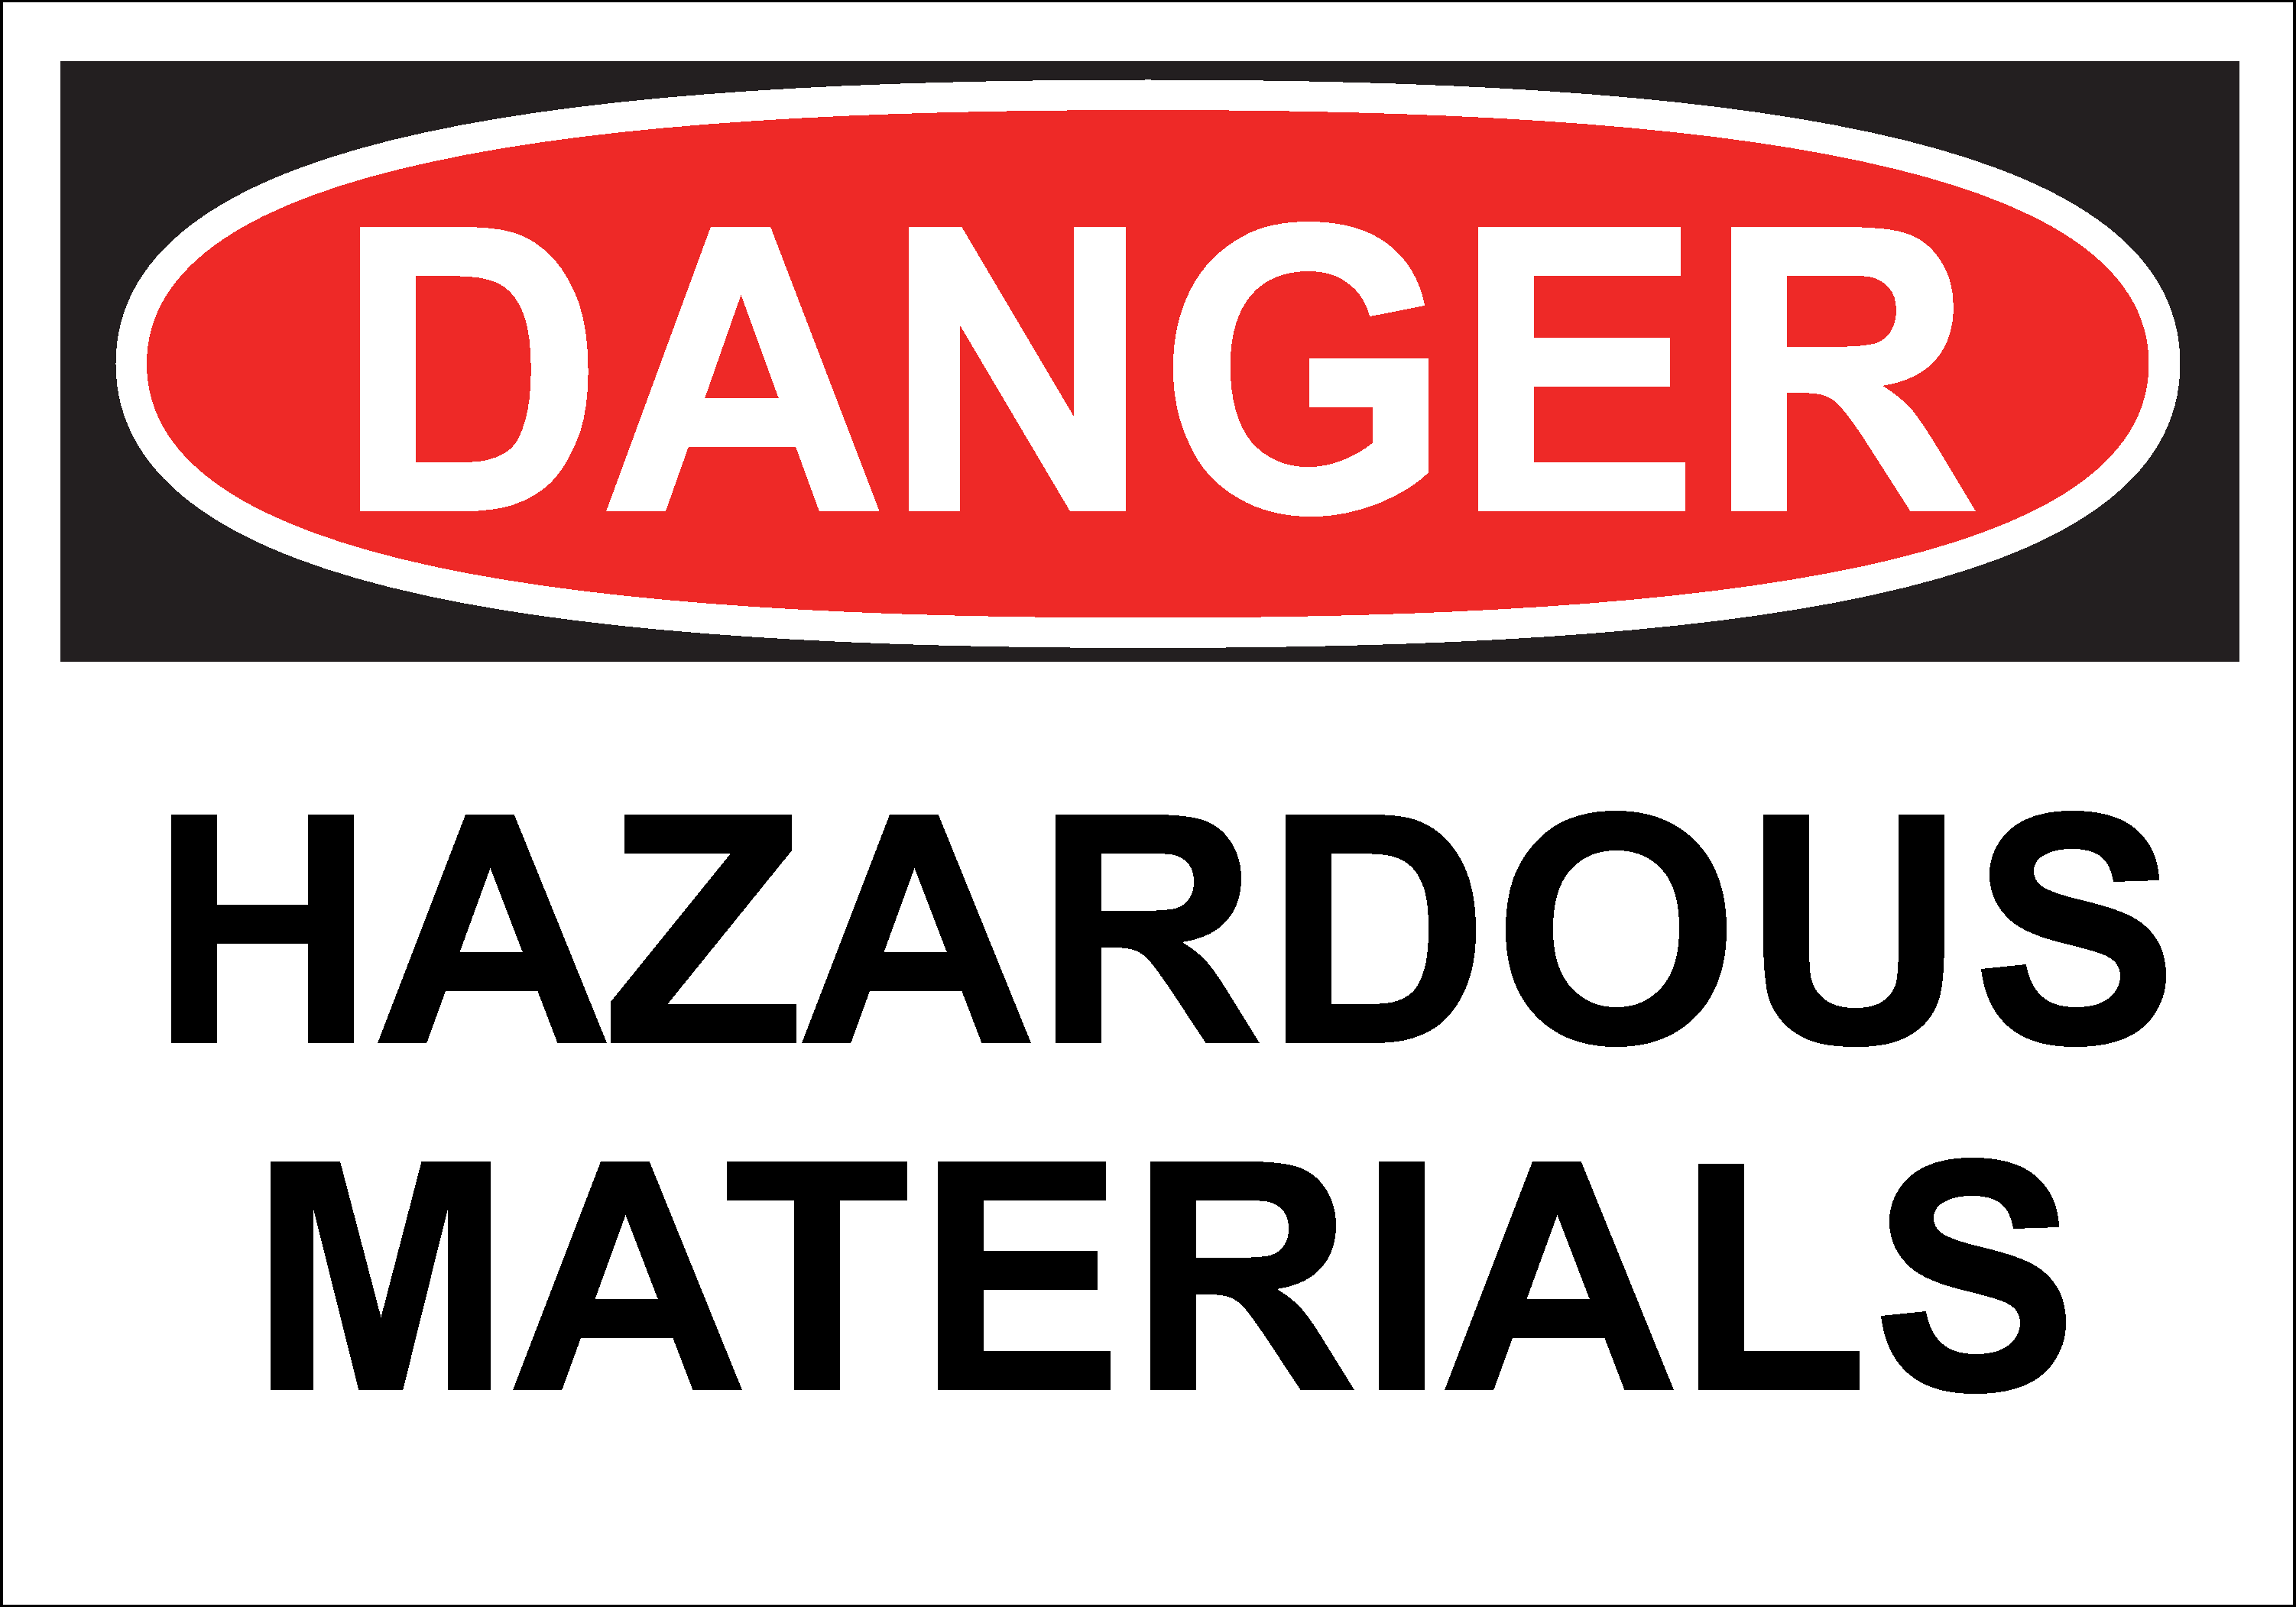 Hazmat Handled Safely